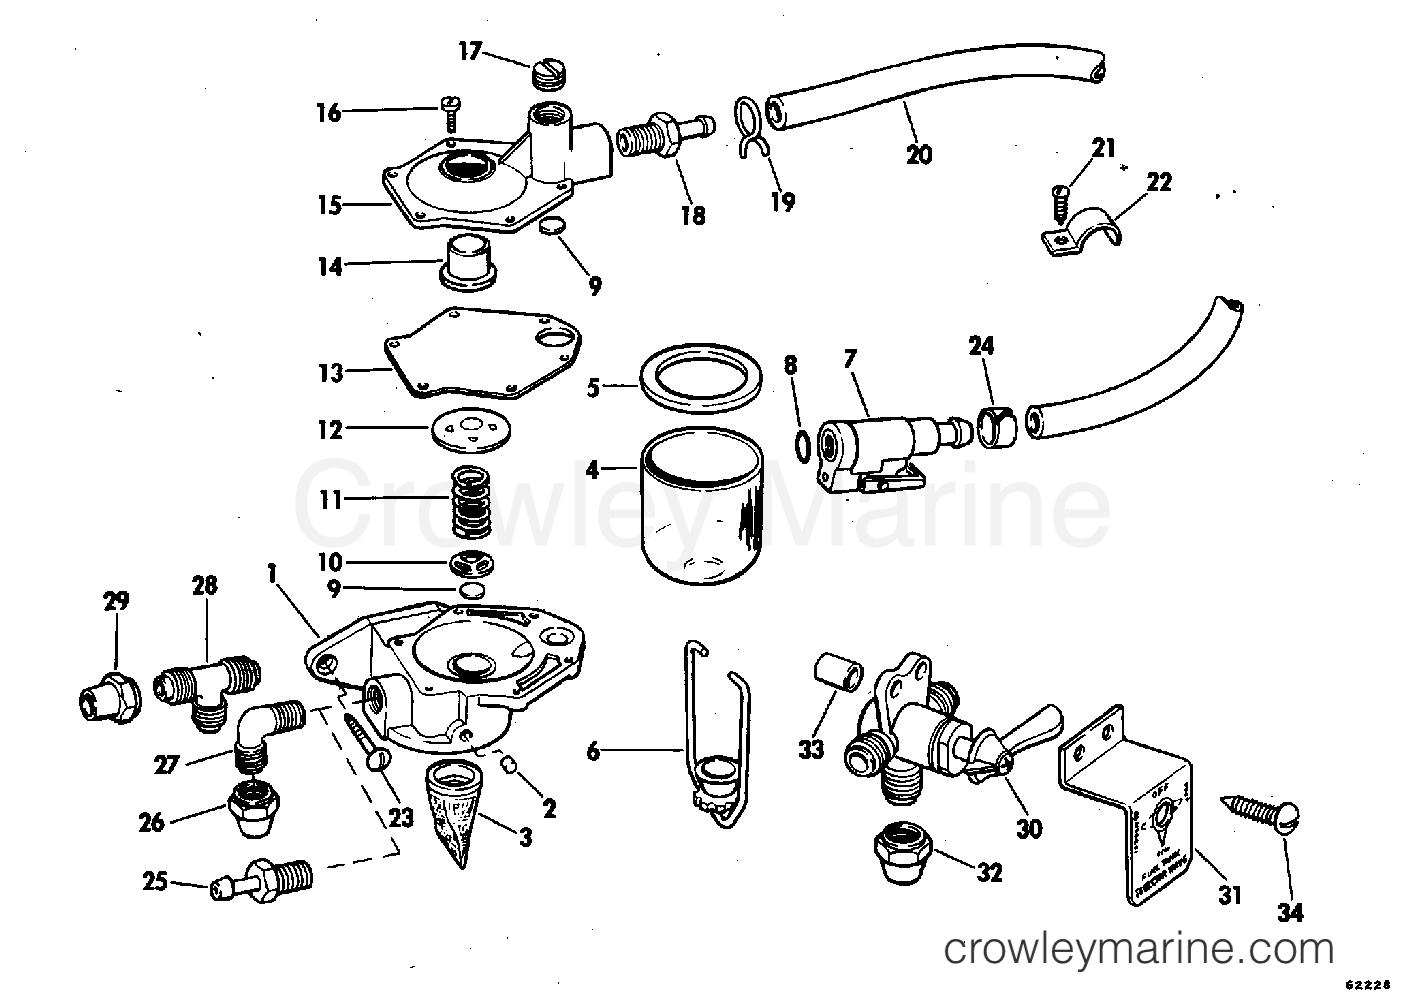 1978 Rigging Parts Accessories - Fuel System - PRIMER PUMP KIT